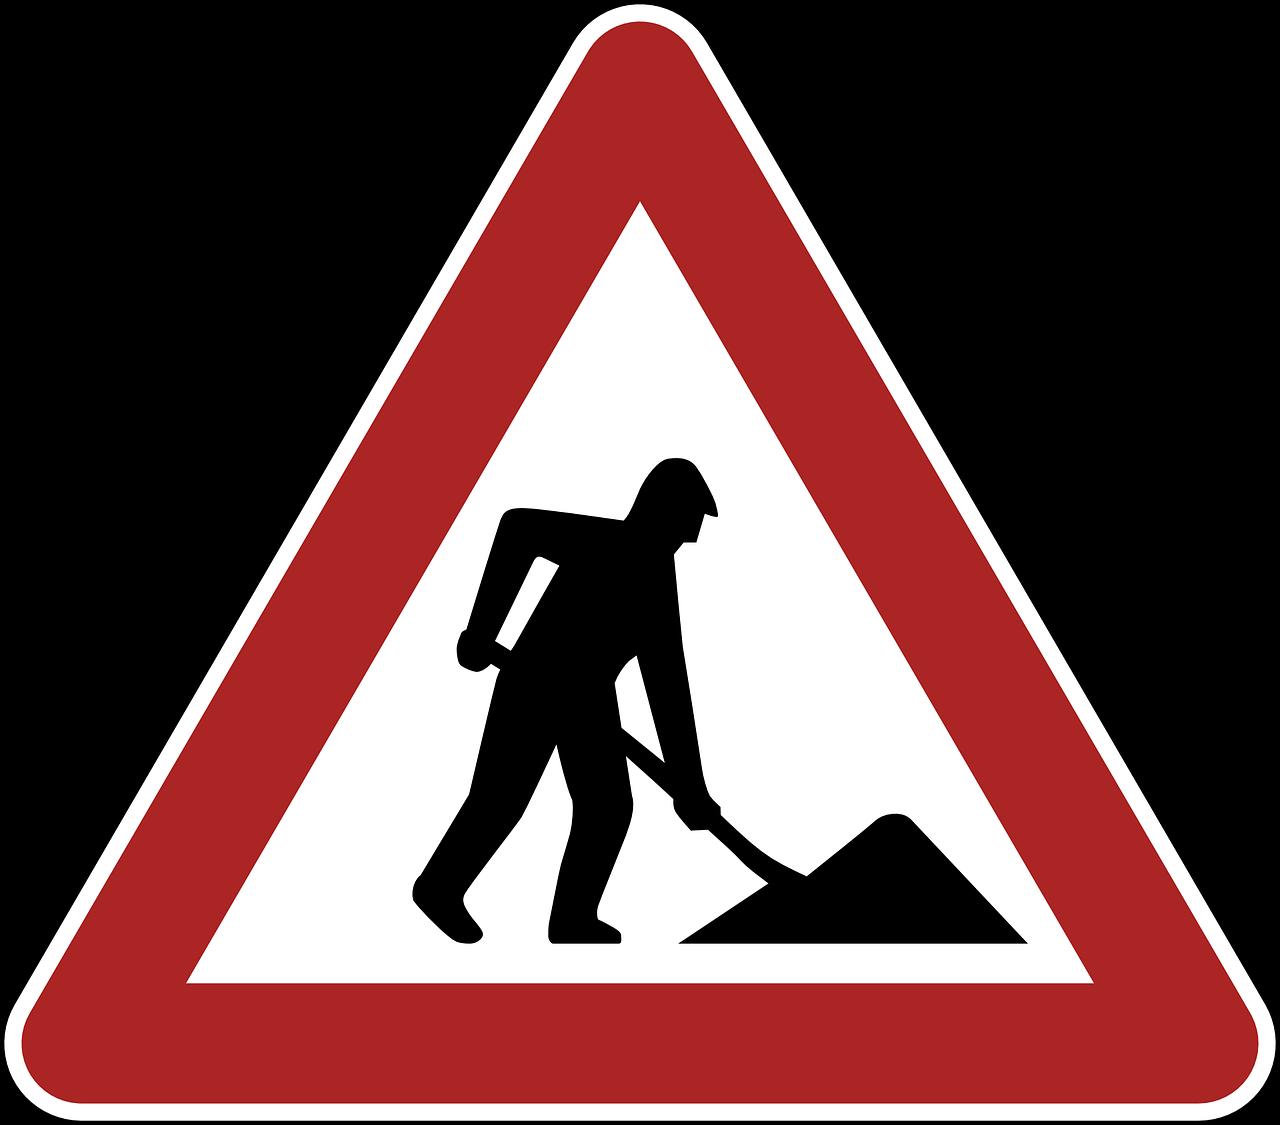 Highway clipart national highway.  m ardot road